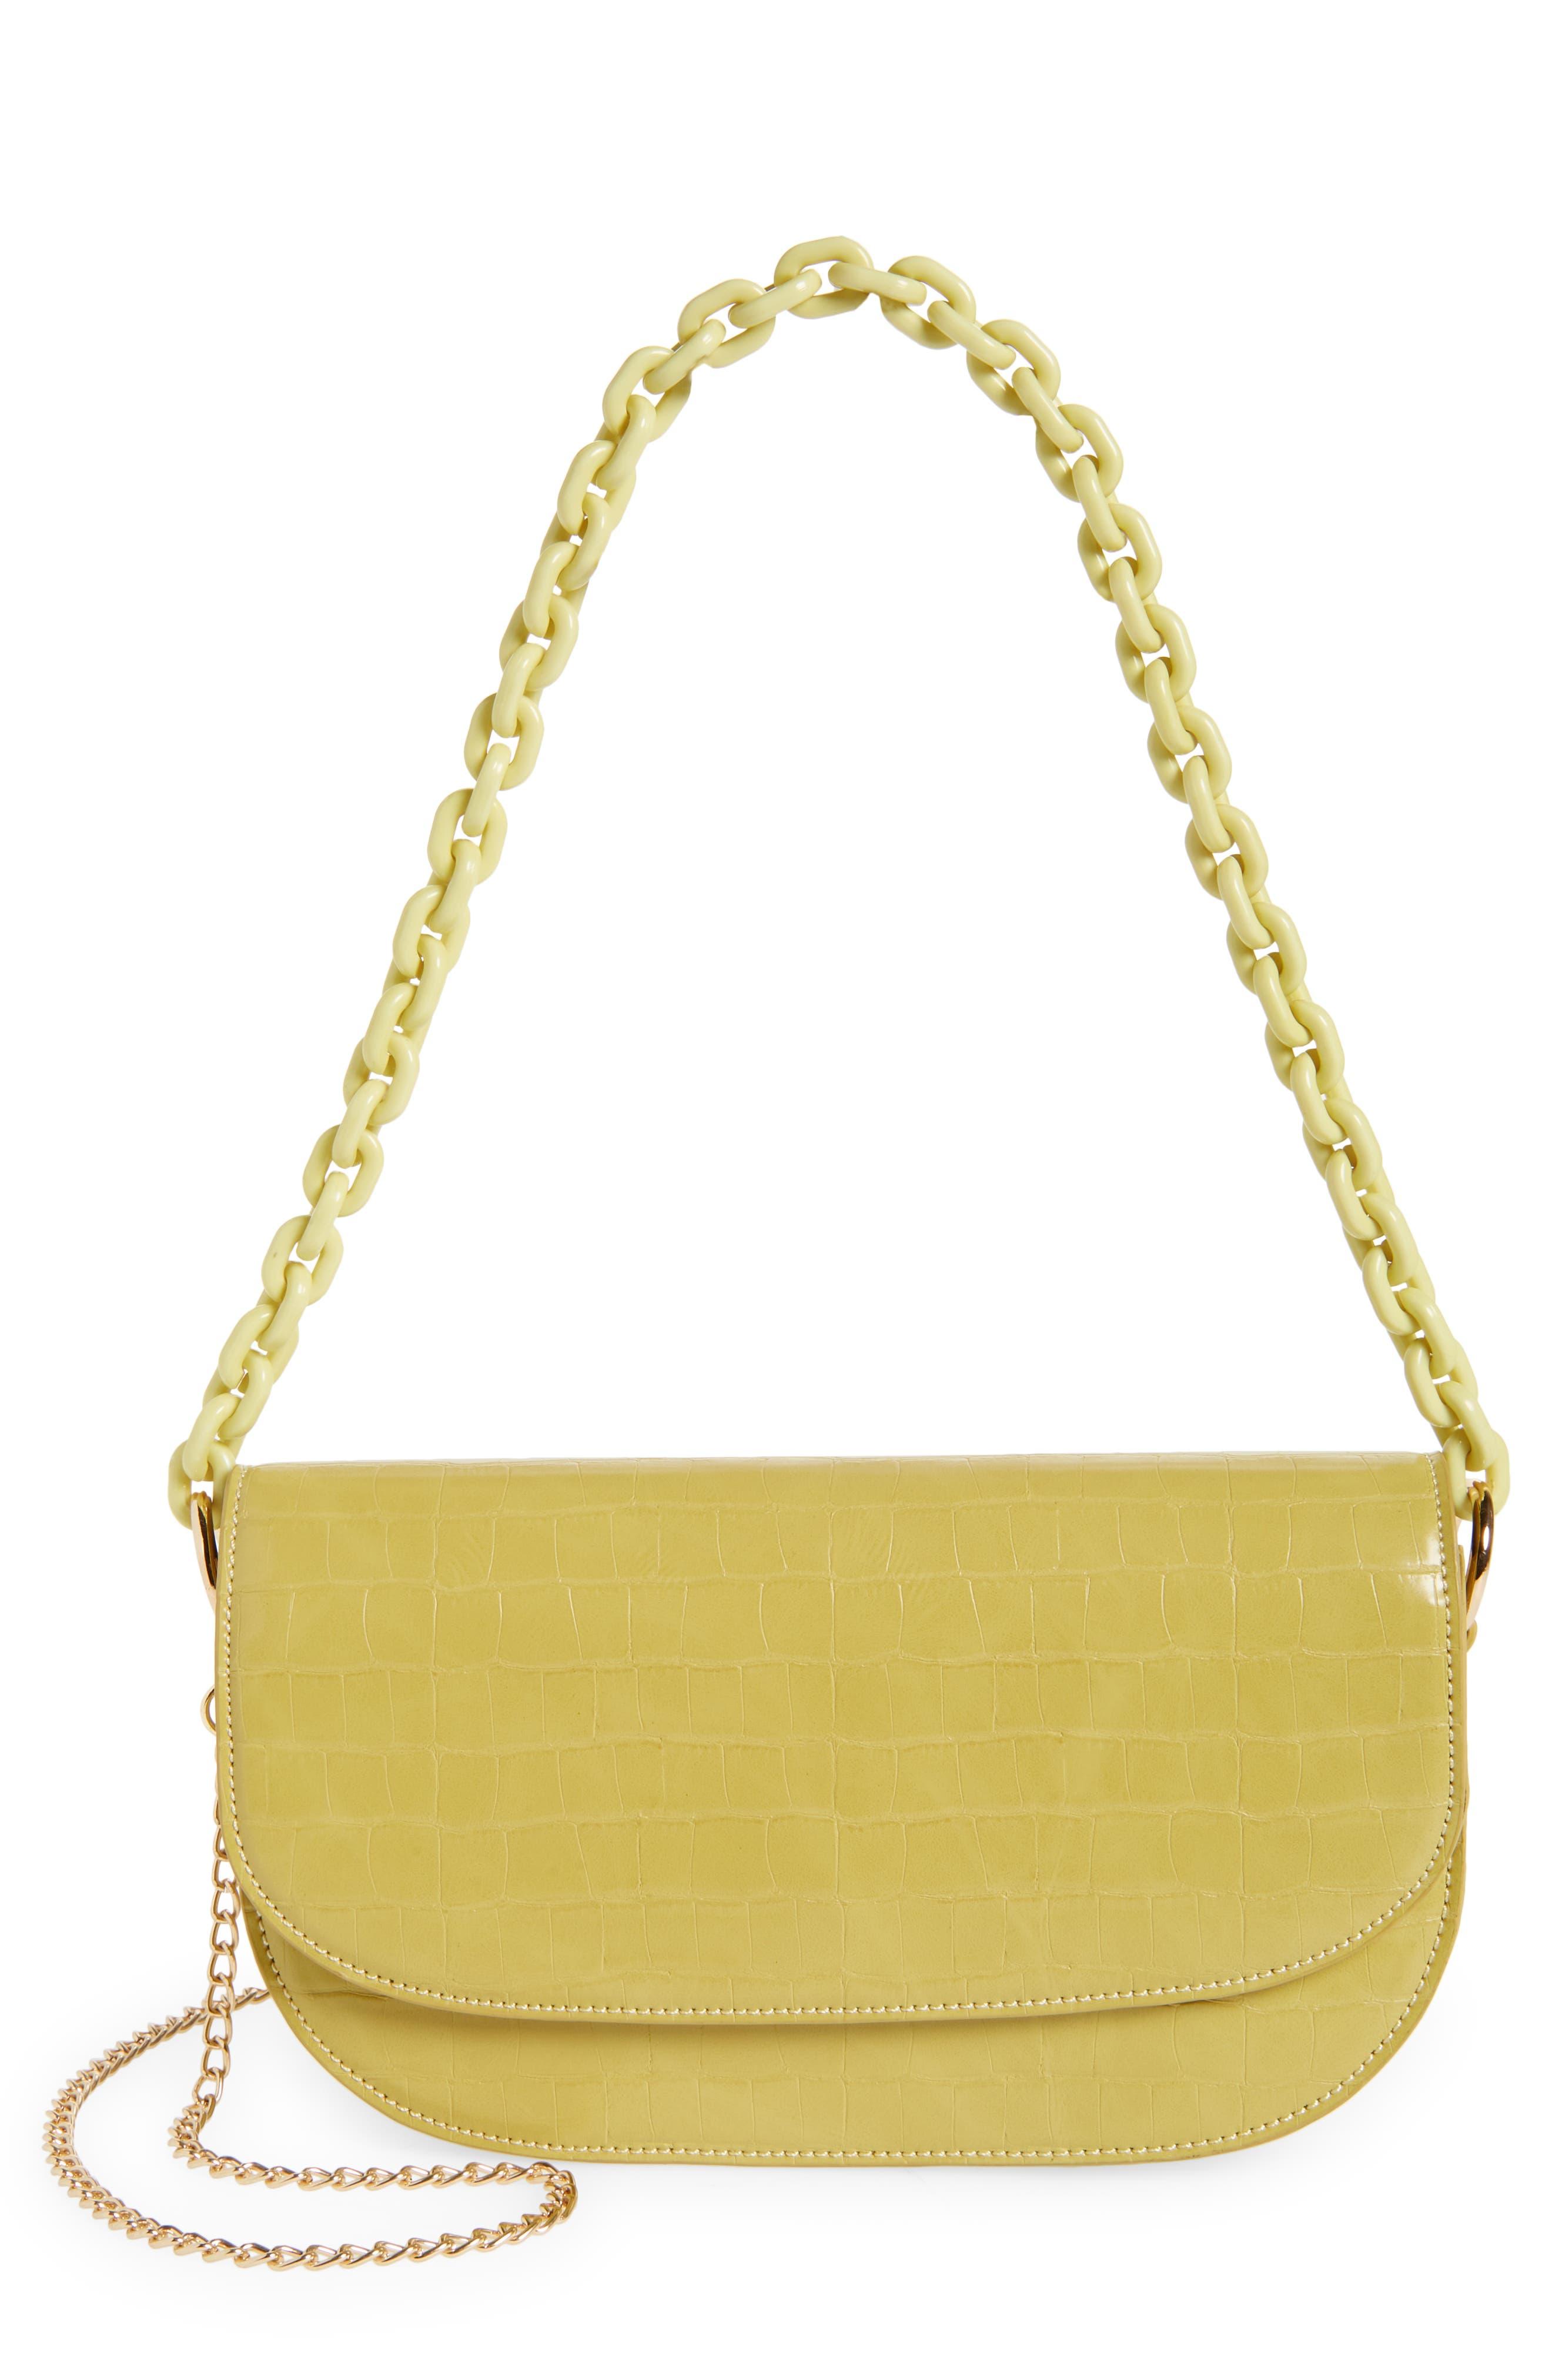 Amy Faux Leather Baguette Crossbody Bag